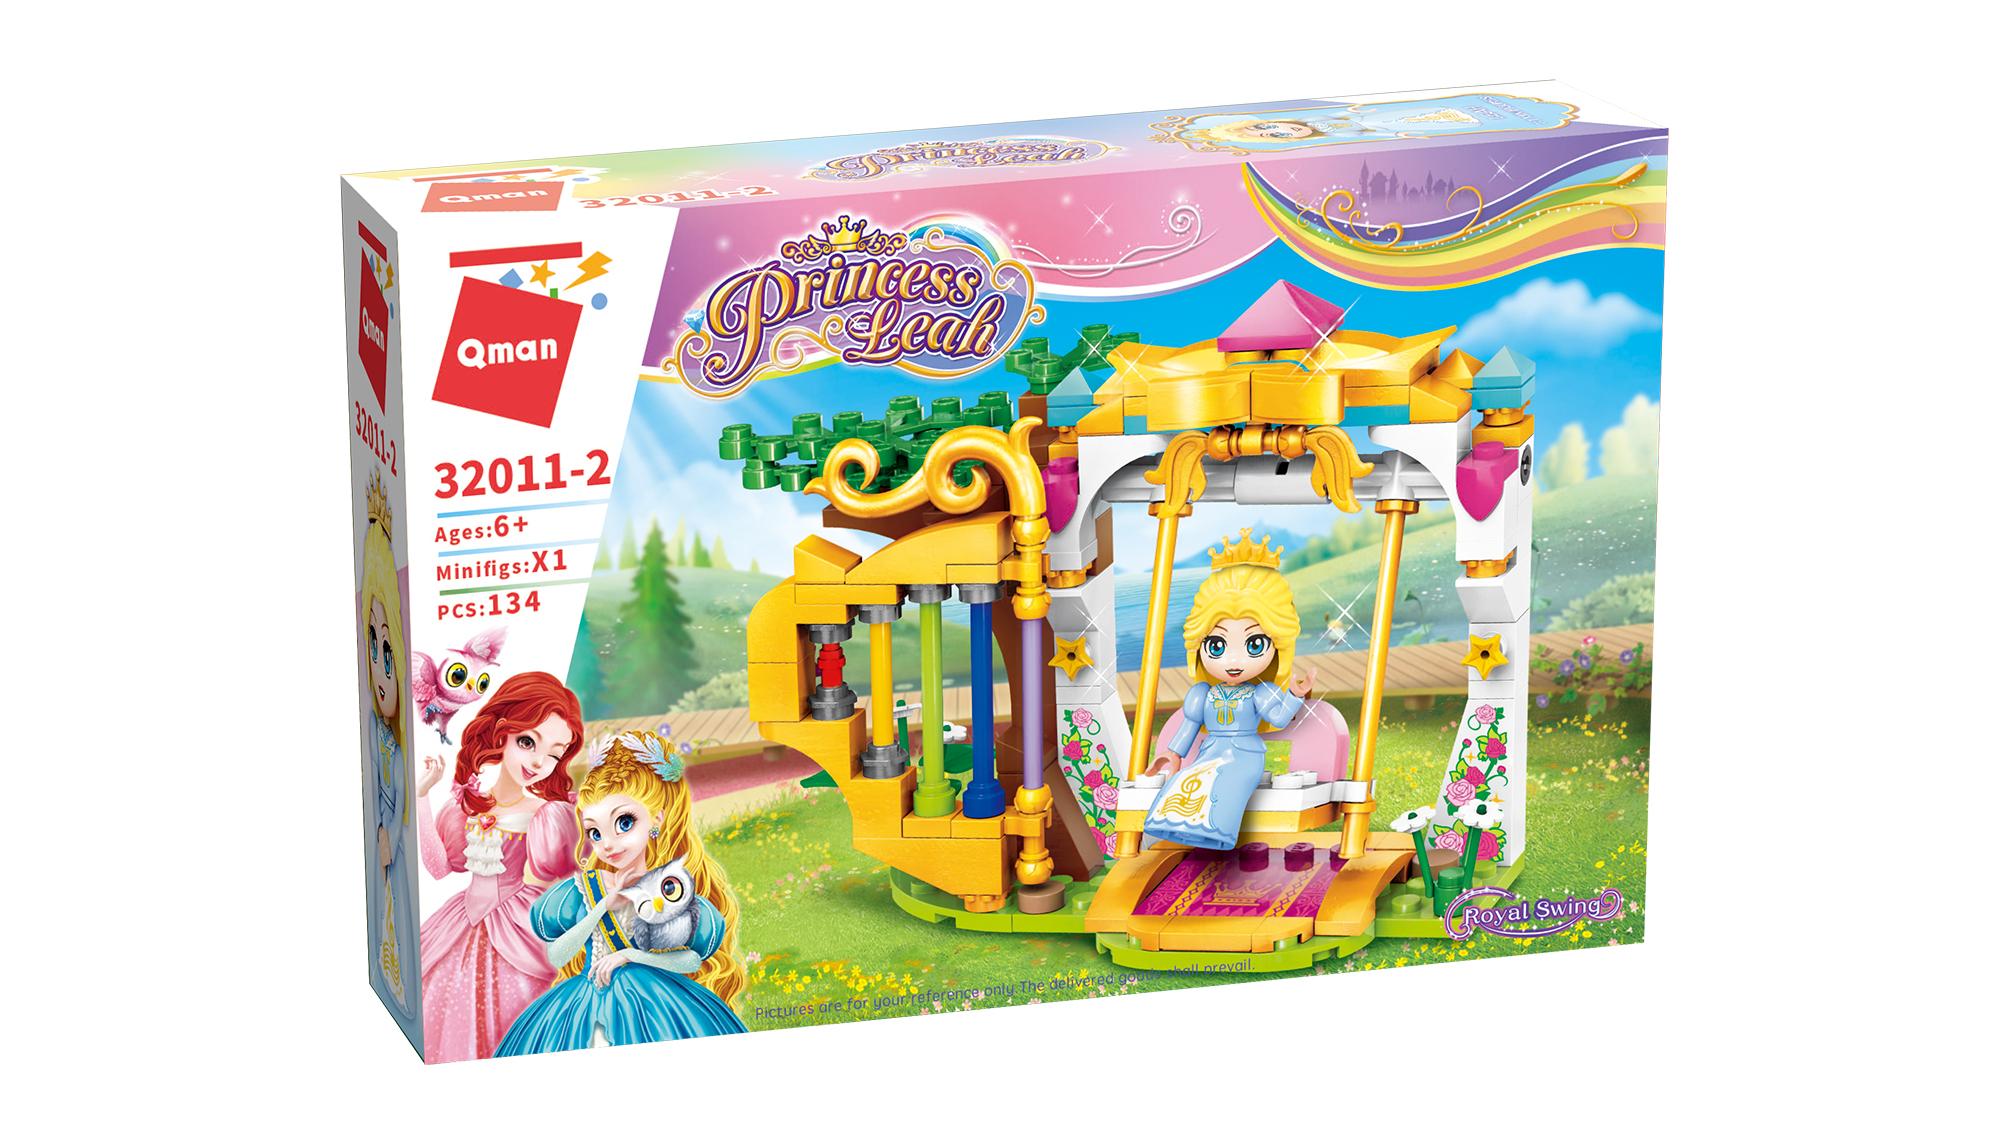 Qman Princess Leah 32011-2 Královská houpačka